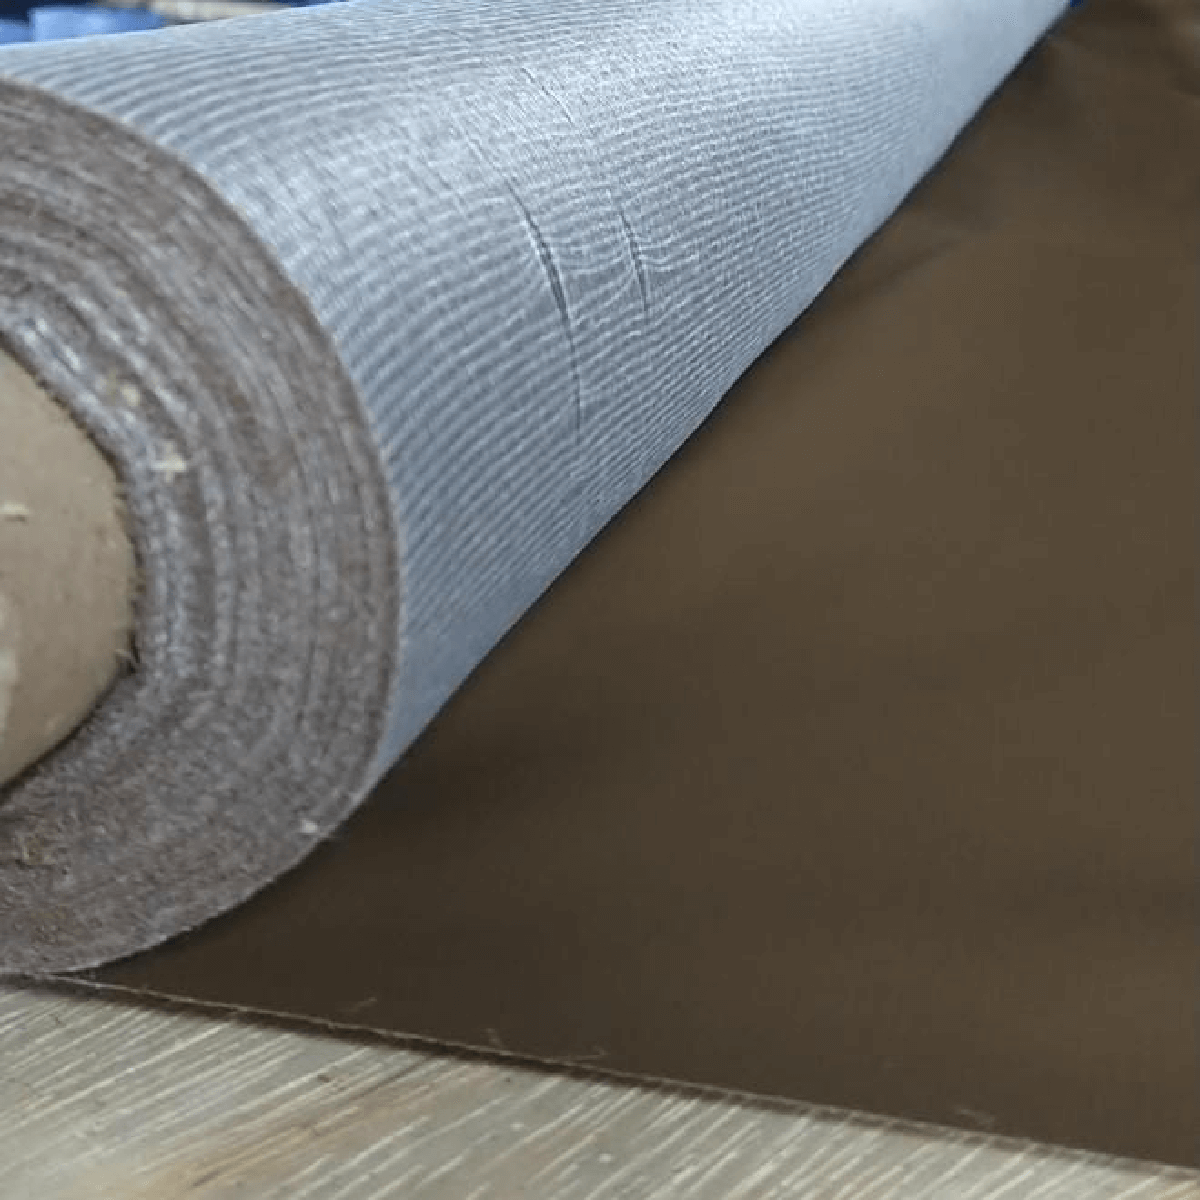 Kit 10m de Napa Bagum Impermeável Div. Cores /METRO  - CarroCasa